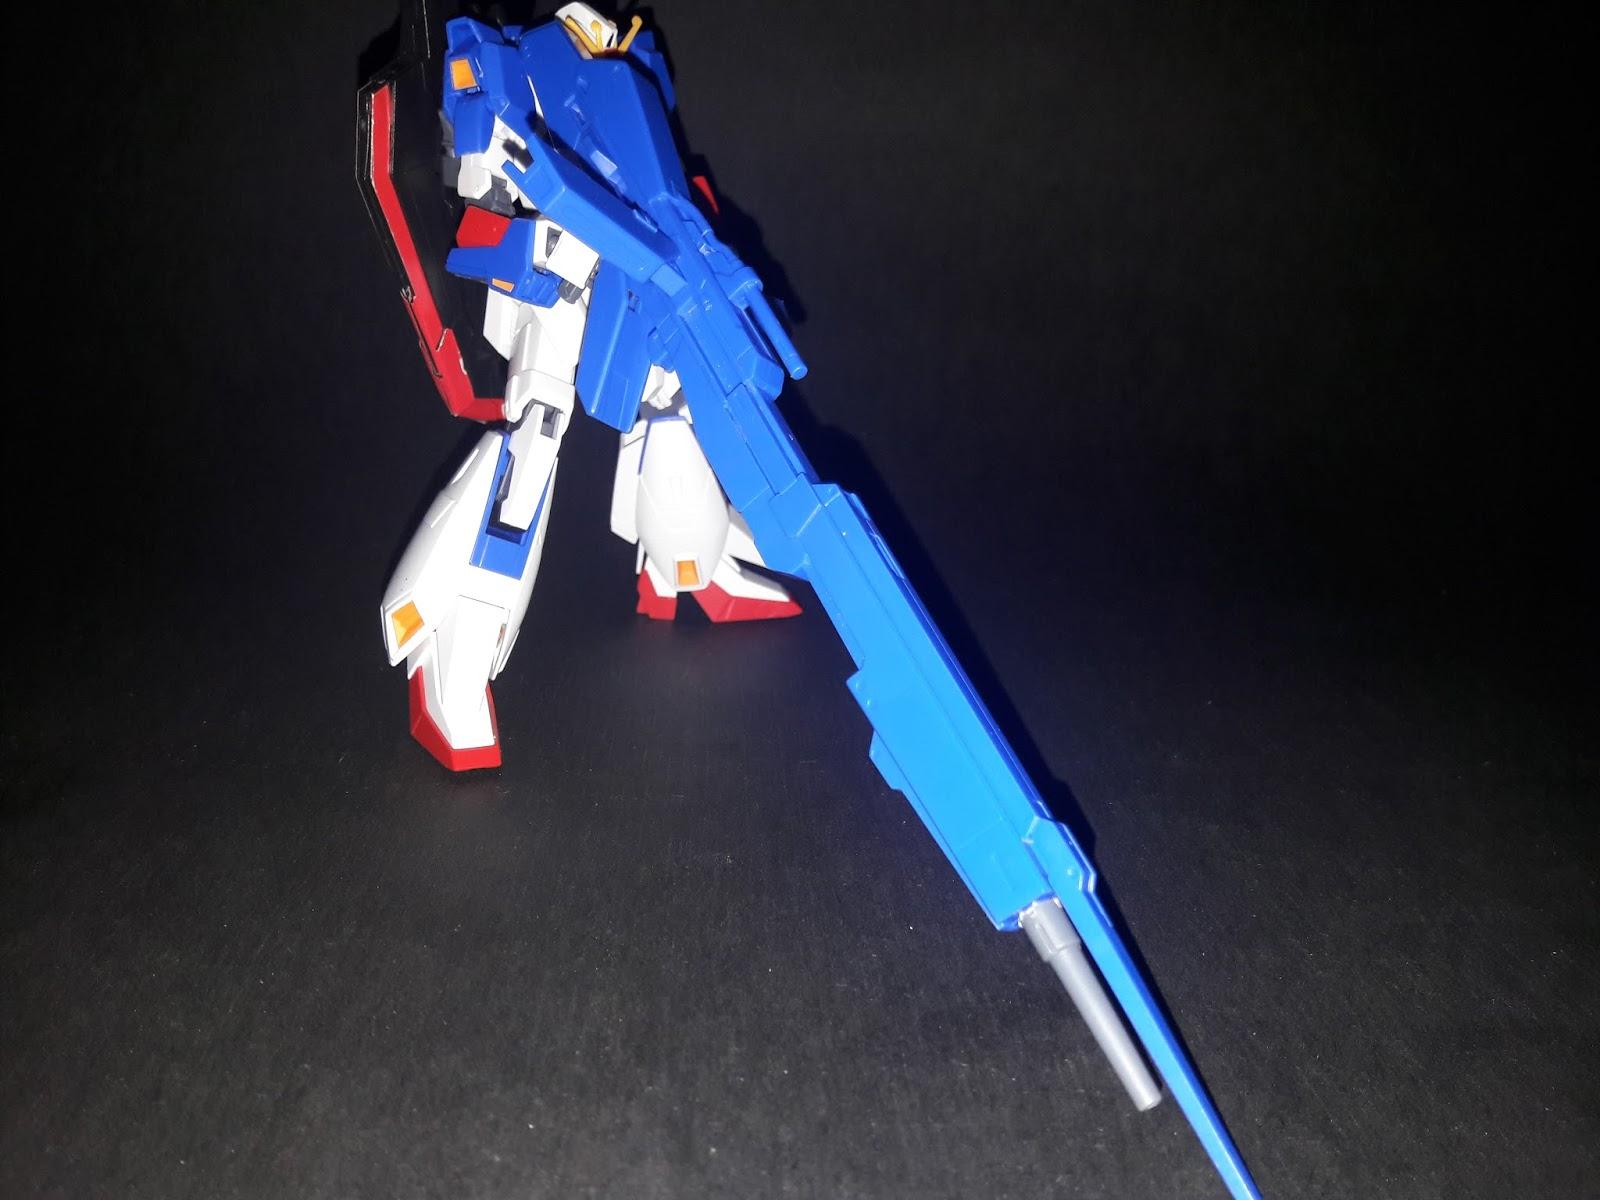 Gundam For The Barrel: HGUC Zeta Gundam REVIVE (Gunpla Evolution Project) Review